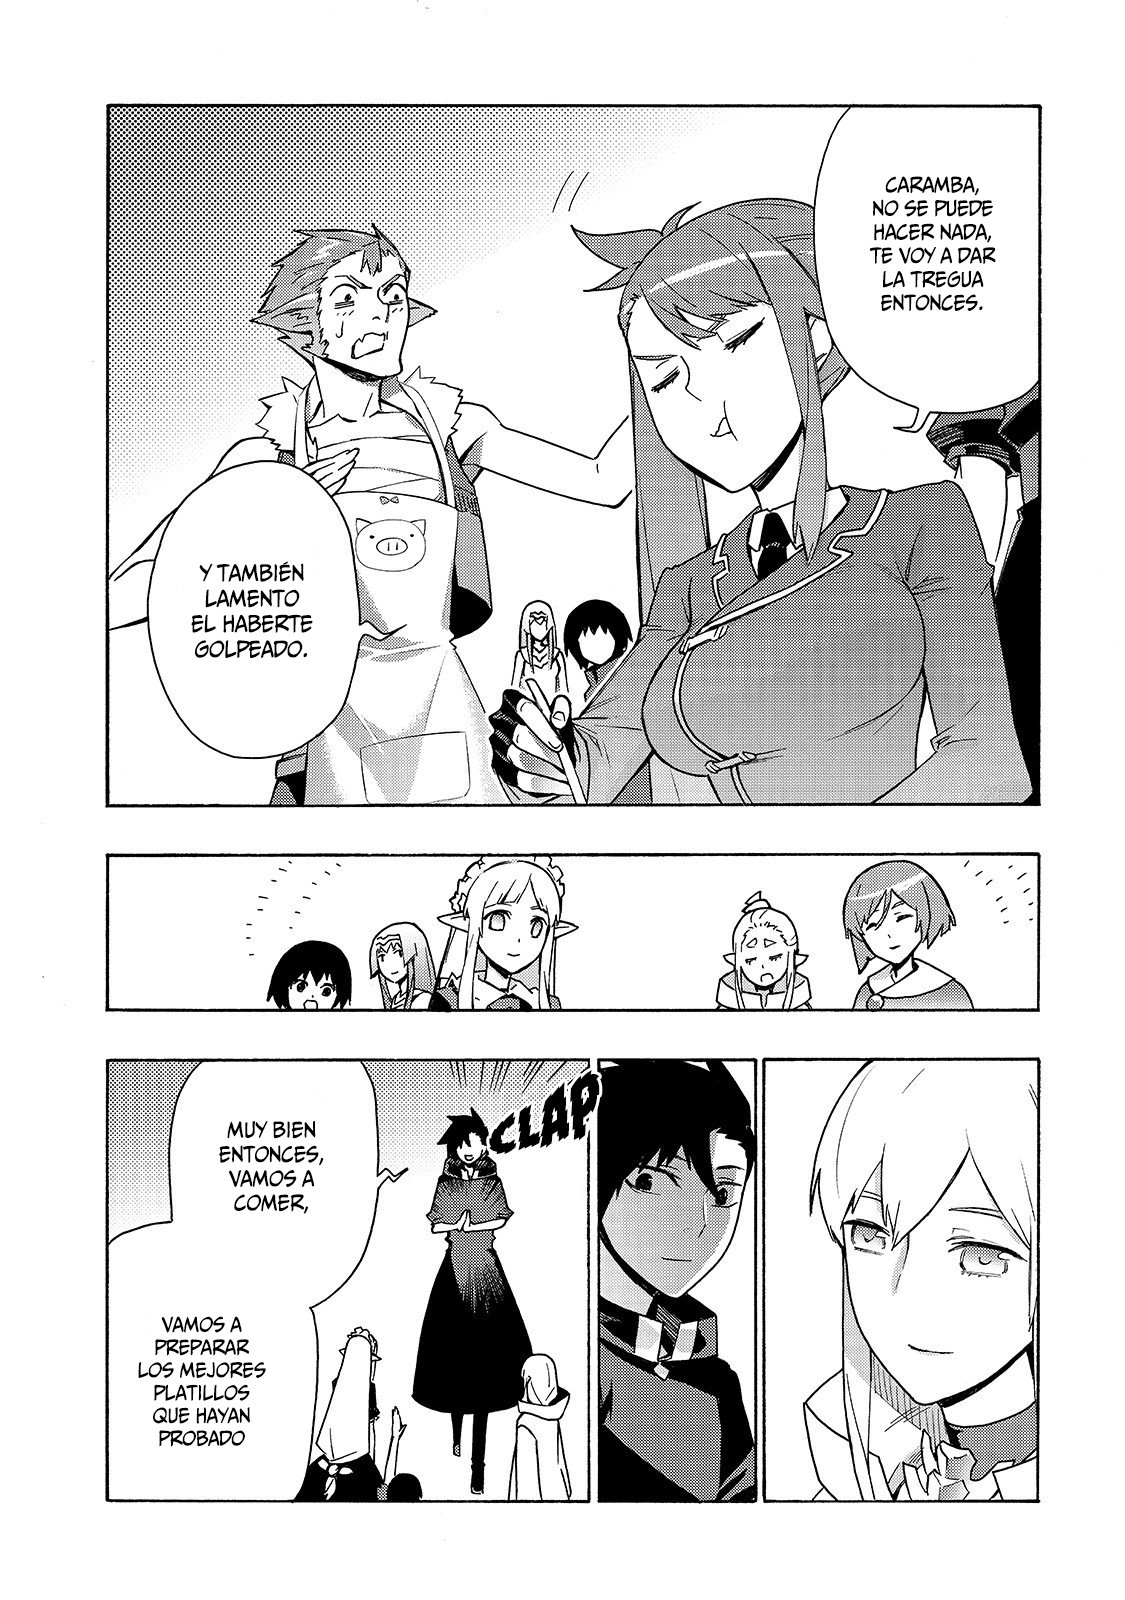 https://nine.mangadogs.com/es_manga/pic8/50/25202/954532/3da0bc962693de1d3b5ed4b0f4191f44.jpg Page 14